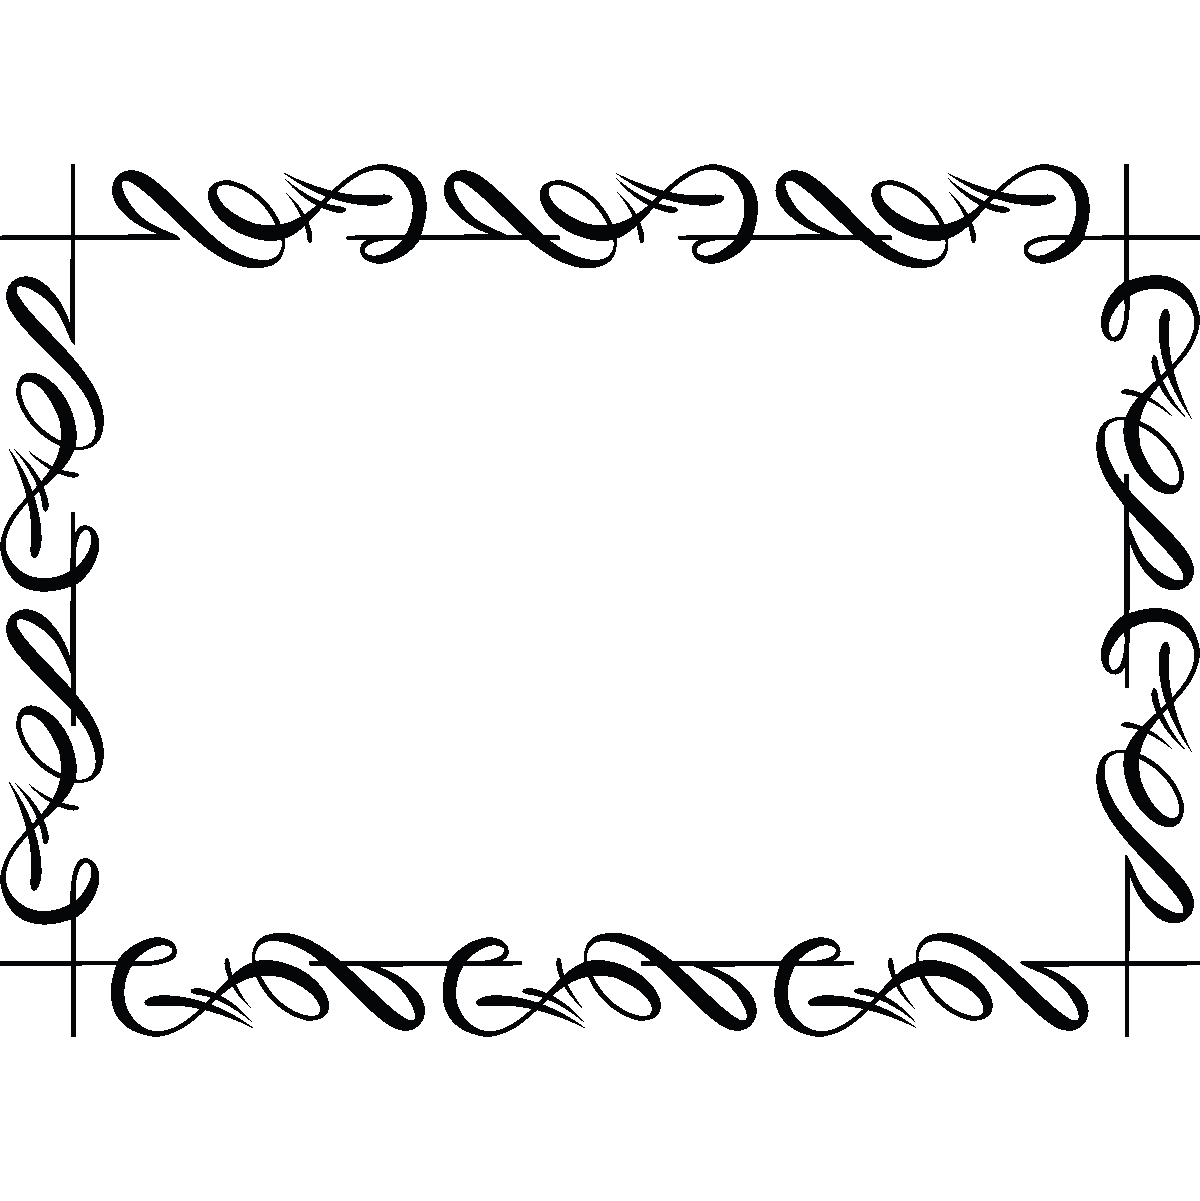 Cadre Bordure stickers muraux design - sticker mural bordure de cadre | ambiance